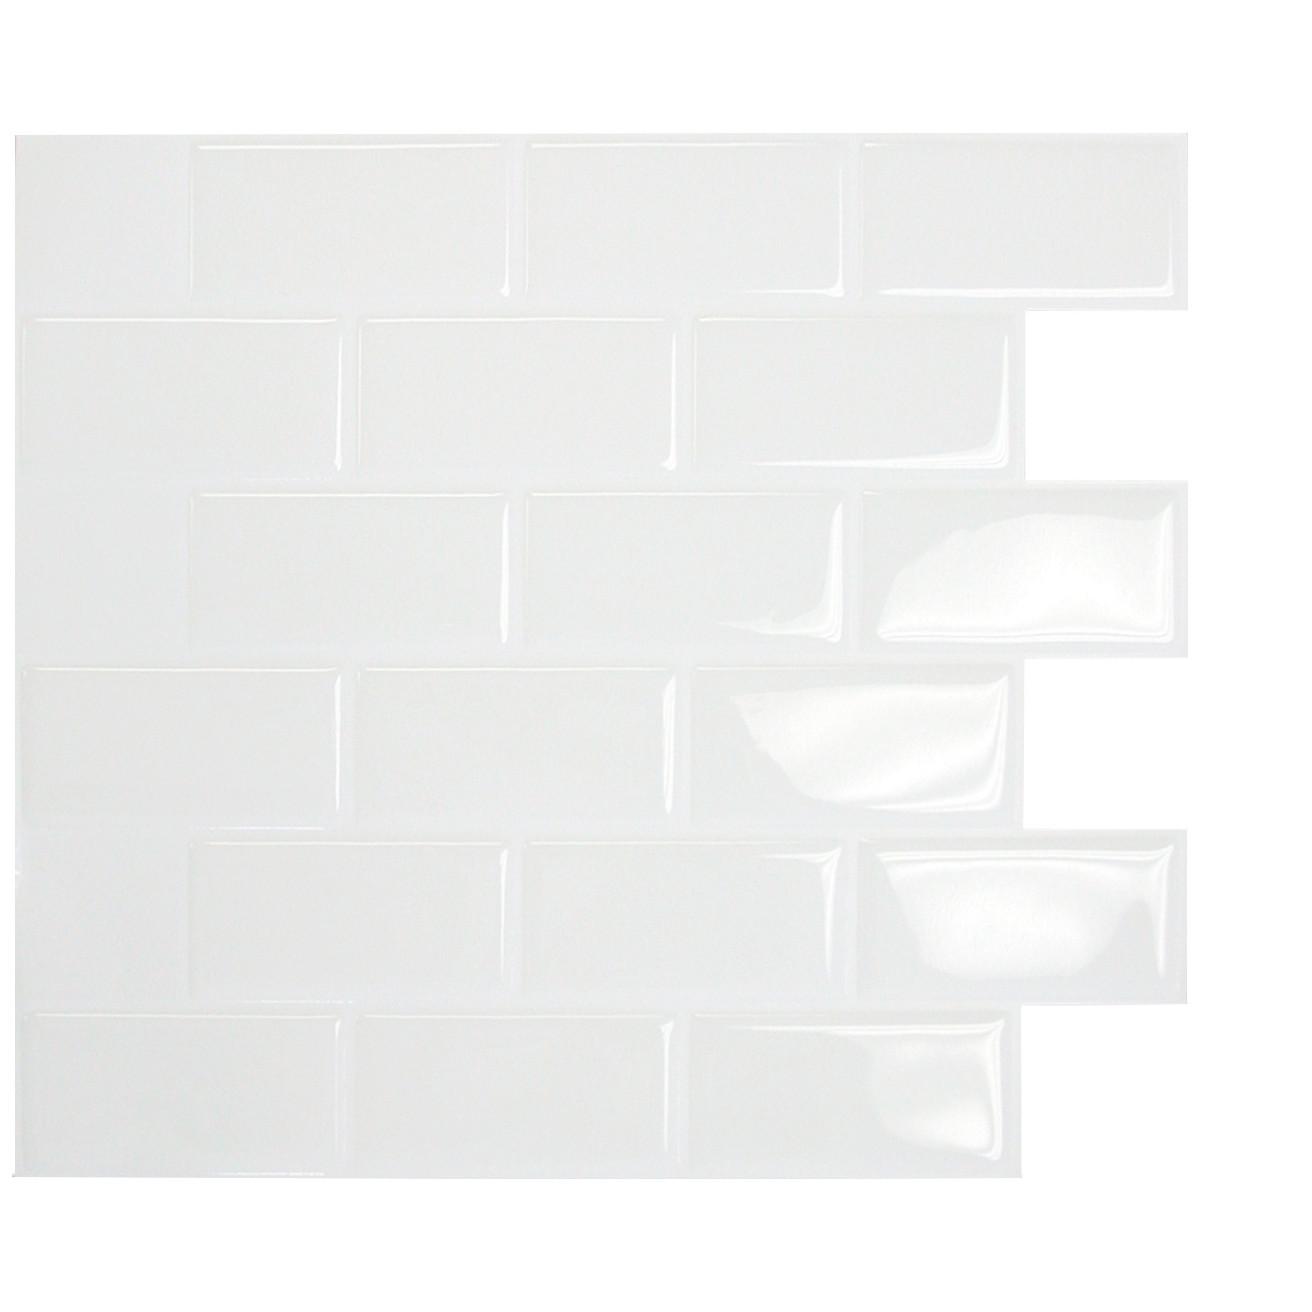 Peel and Stick Glass Tile Backsplash | Peel and Stick Vinyl Tile Flooring | Peel and Stick Tile